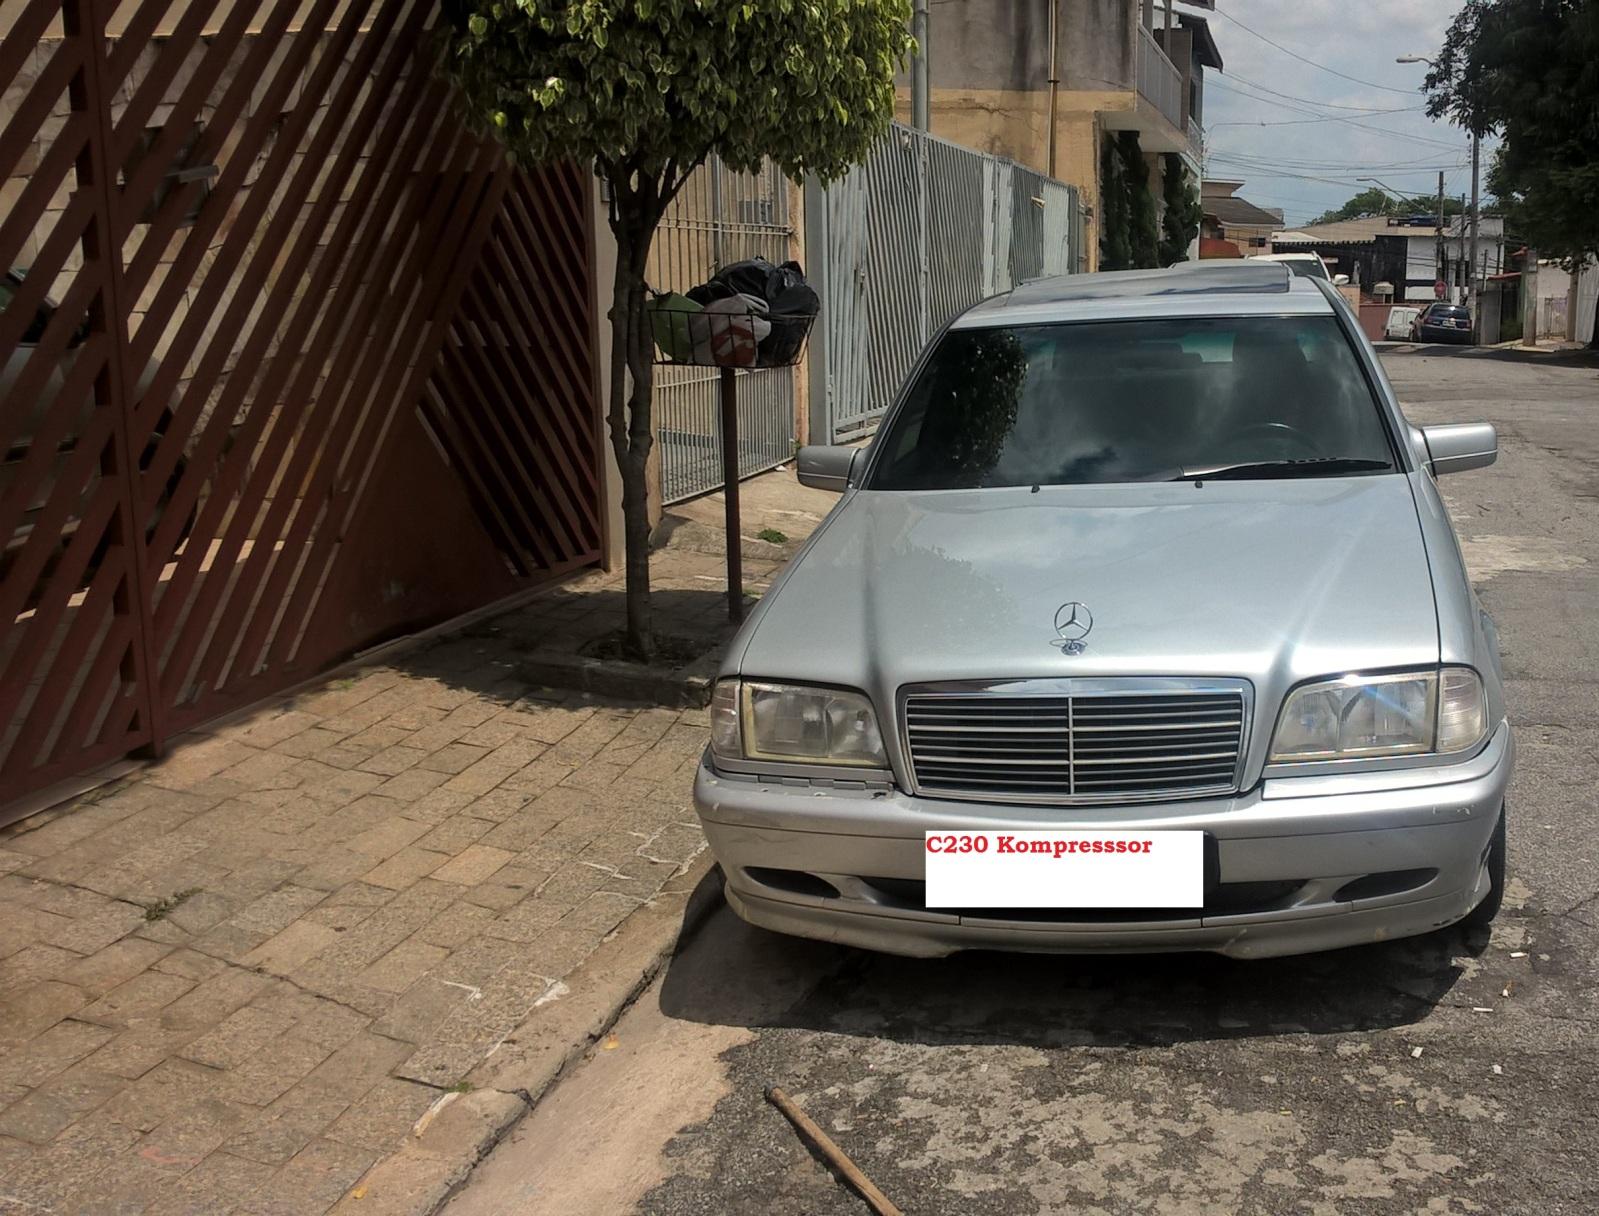 (VENDO): W202 C230 Kompressor 1997/1998 - R$ 33.000,00 2s8o0tf